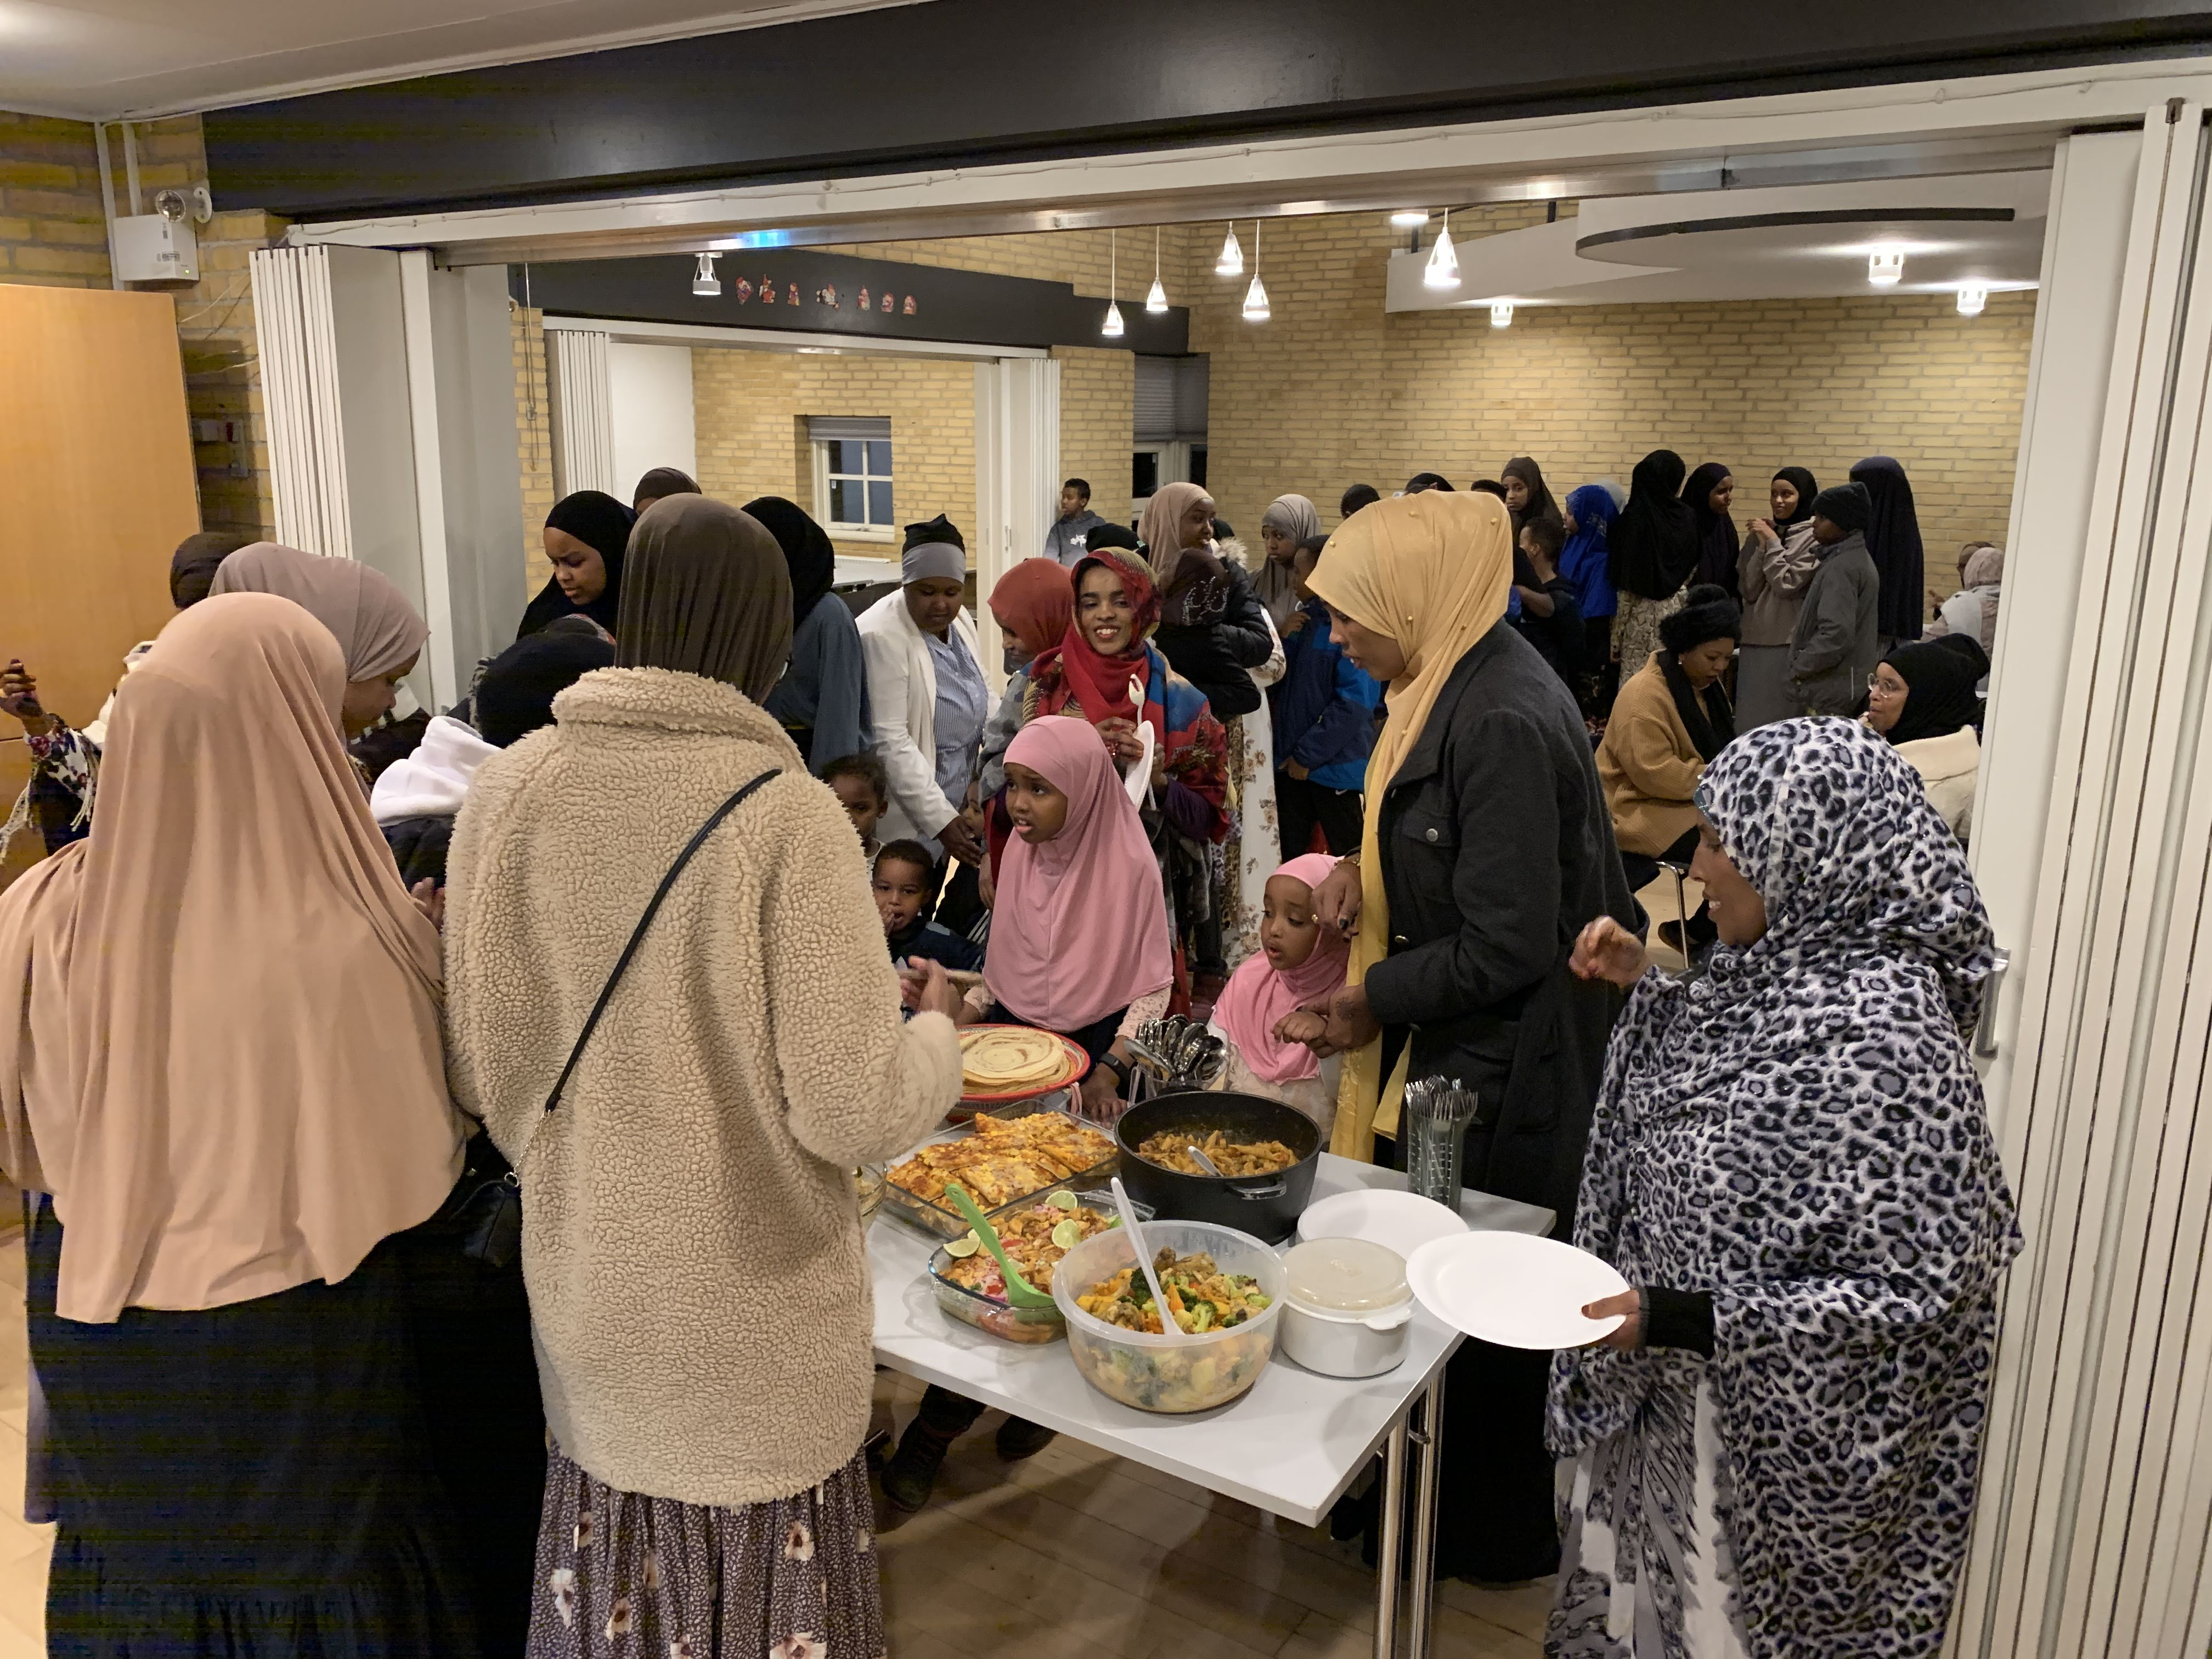 fællesspisning-den-28-12-2019-i-beboerhuset-på-Ellekonebakken-025